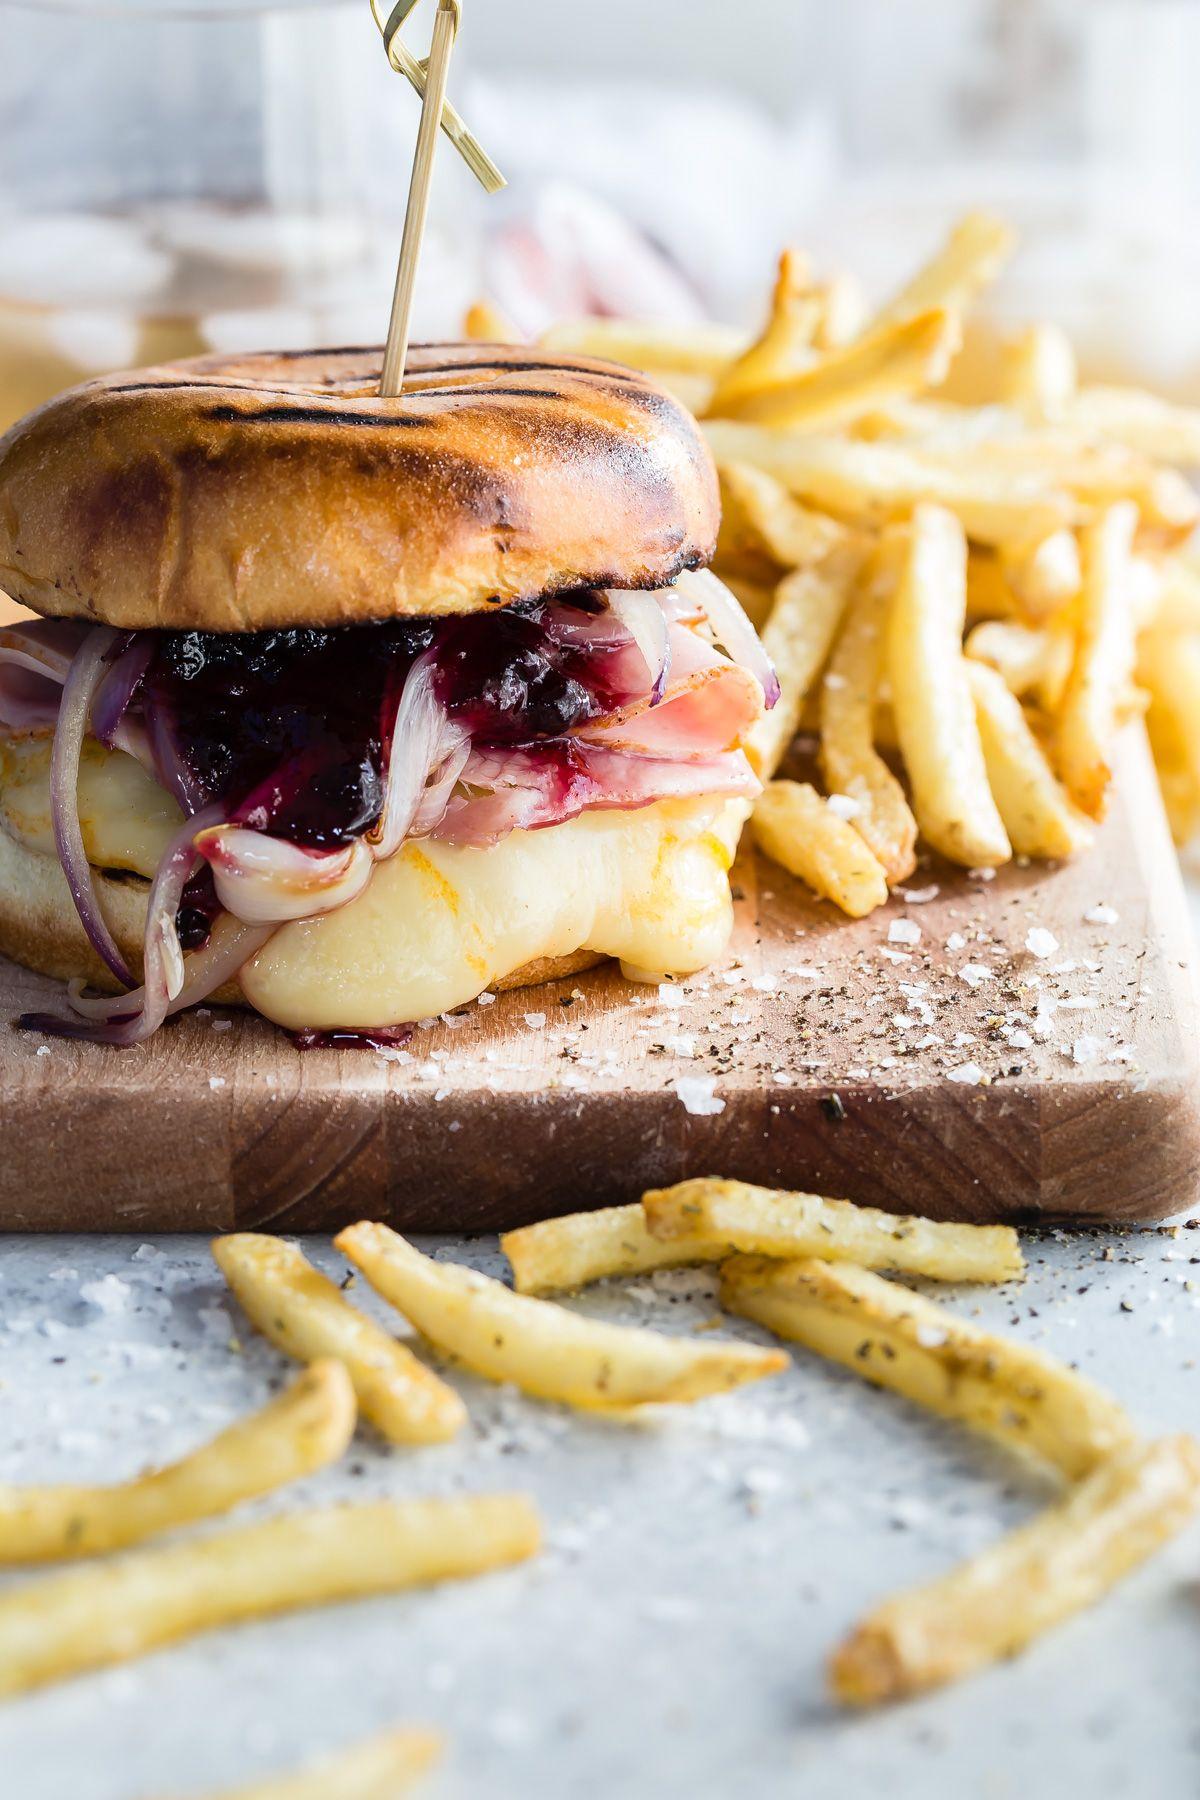 Monte Cristo Burger with Arla Muenster Sliced Cheese